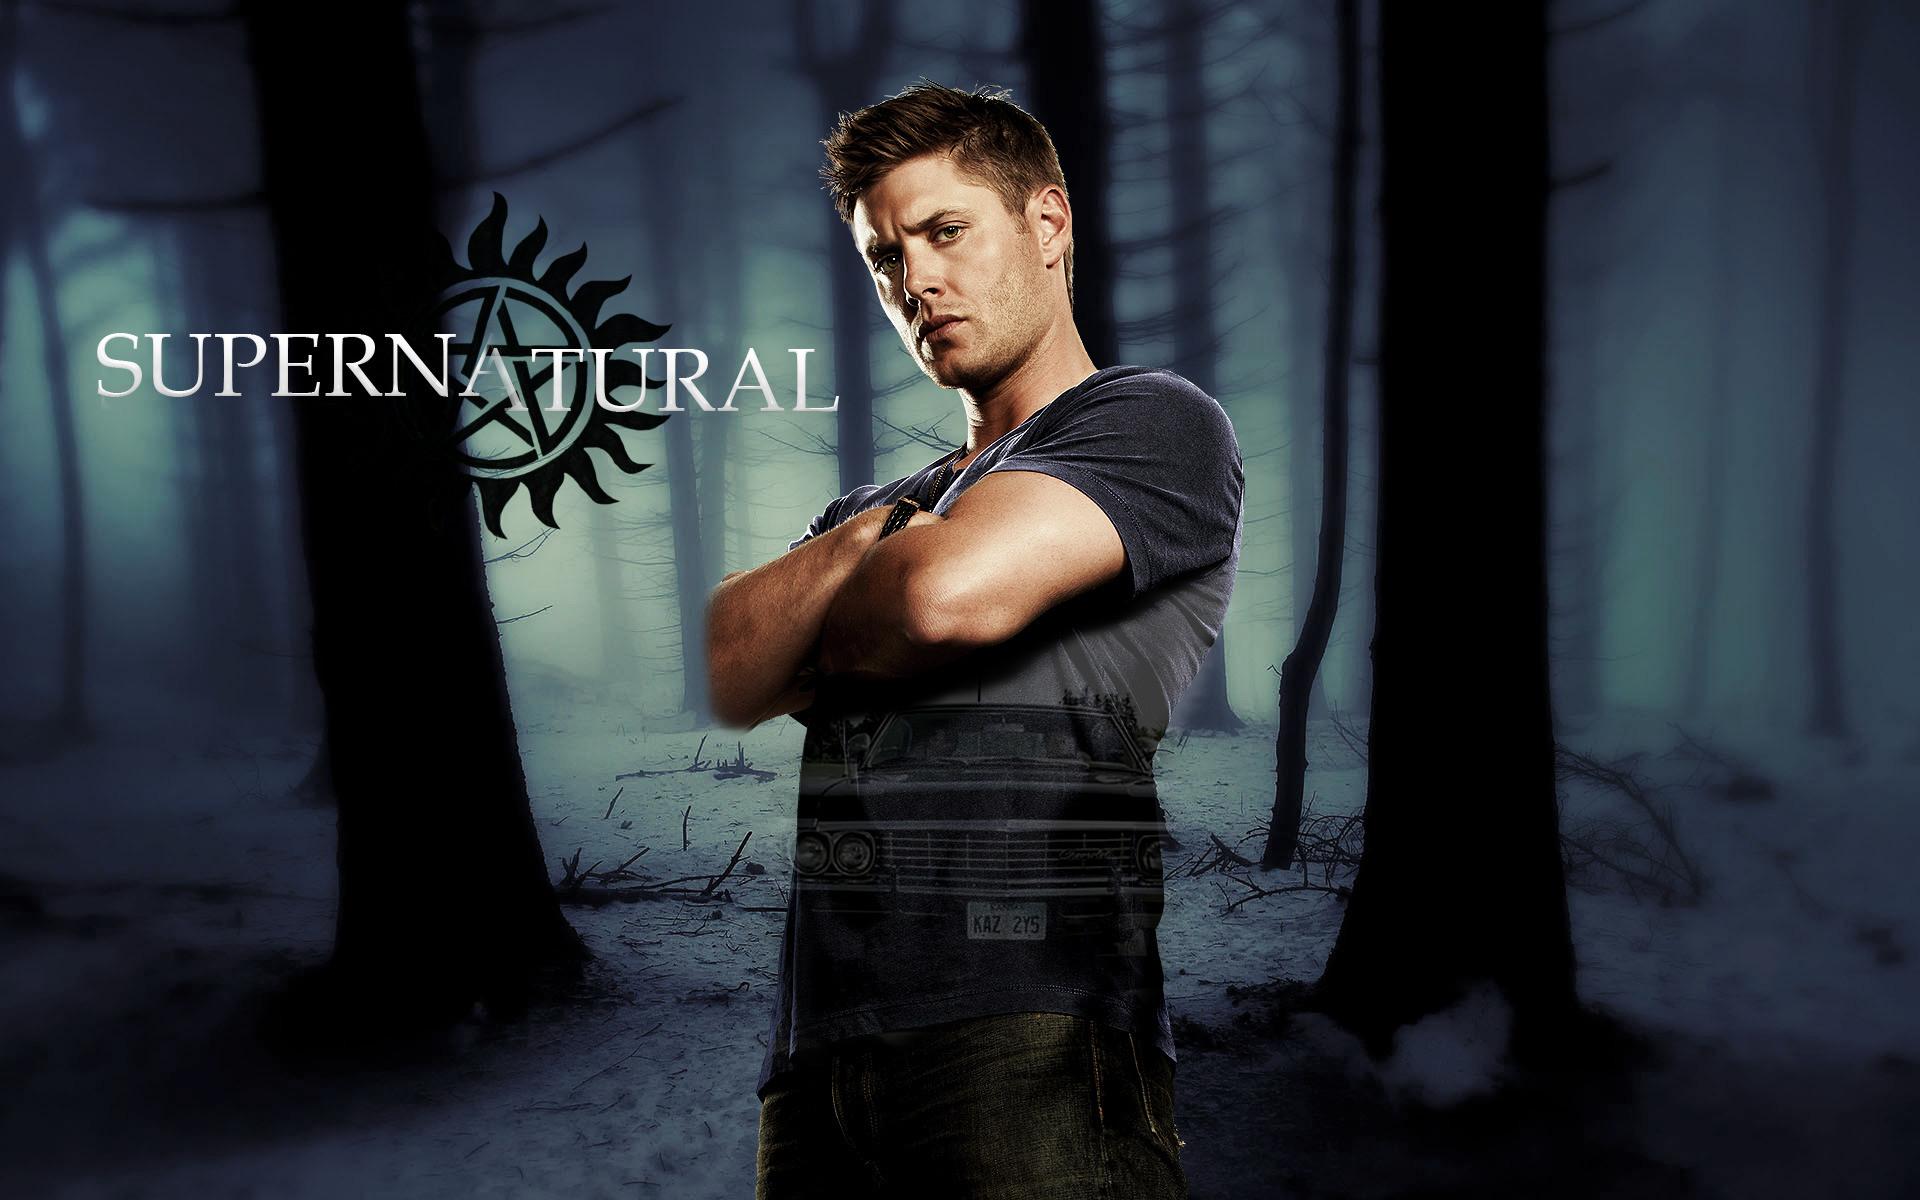 Supernatural, Chevrolet Impala, Hunter, Fantasy Art, Adobe Photoshop, Dean  Winchester Wallpapers HD / Desktop and Mobile Backgrounds